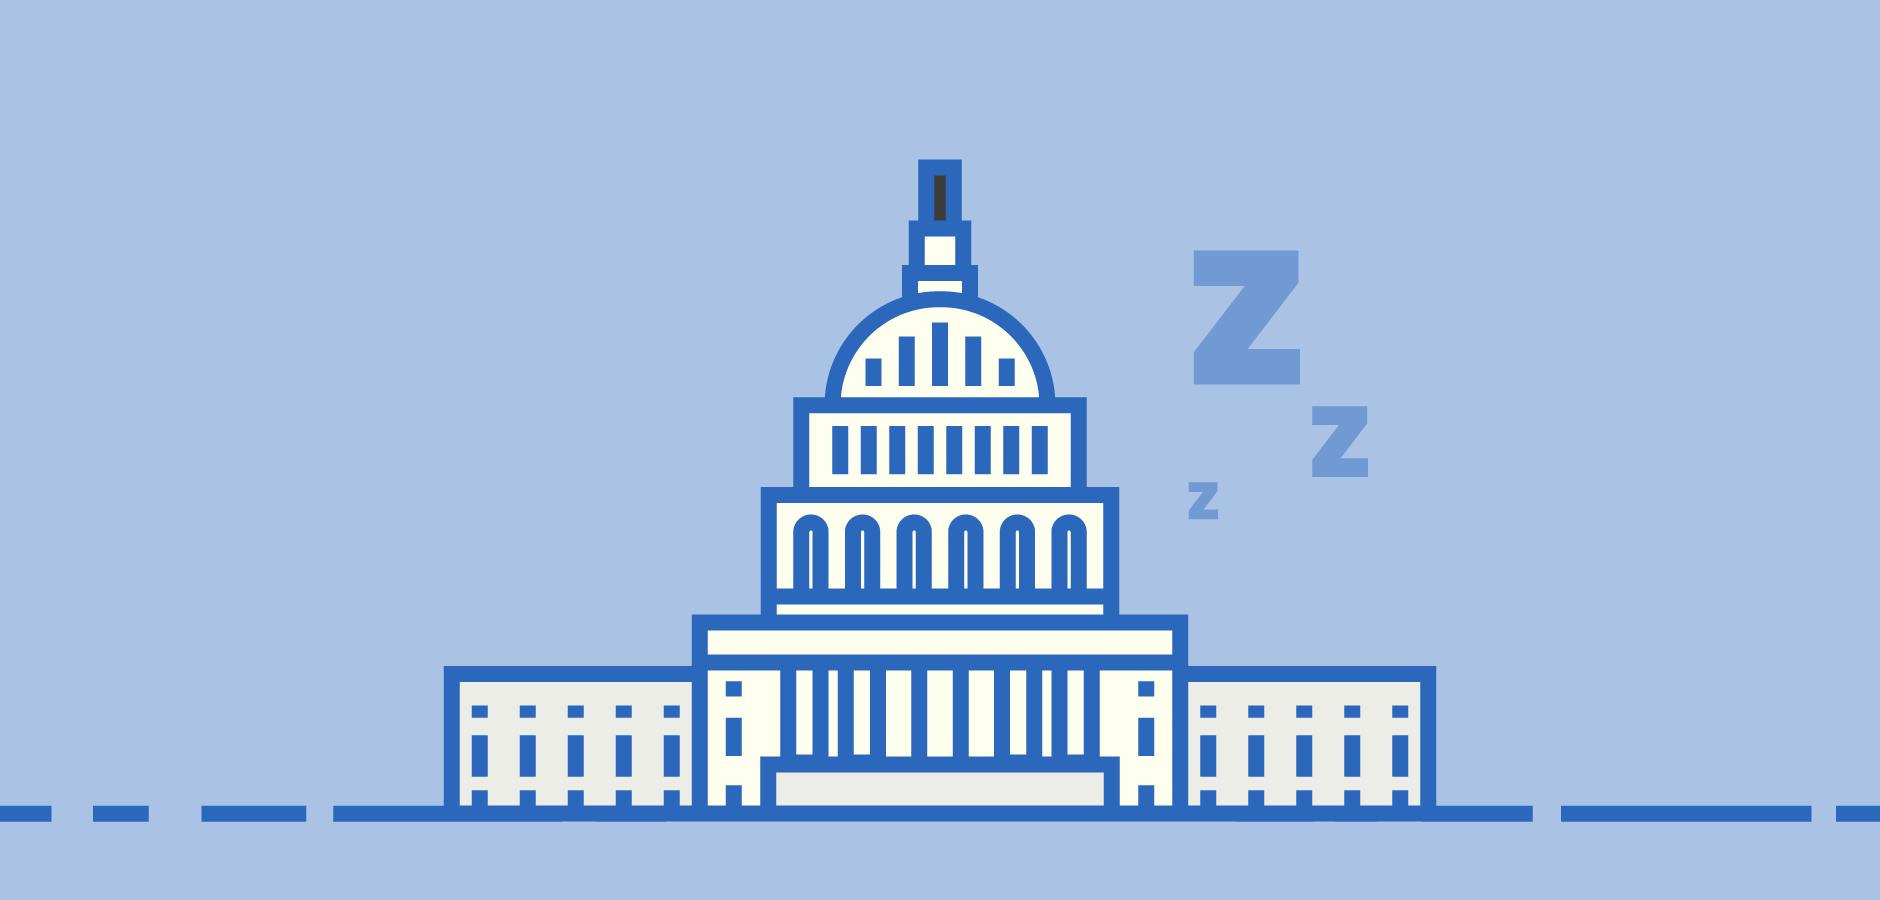 Dot Pixel - Illustration - Senate Sleeps